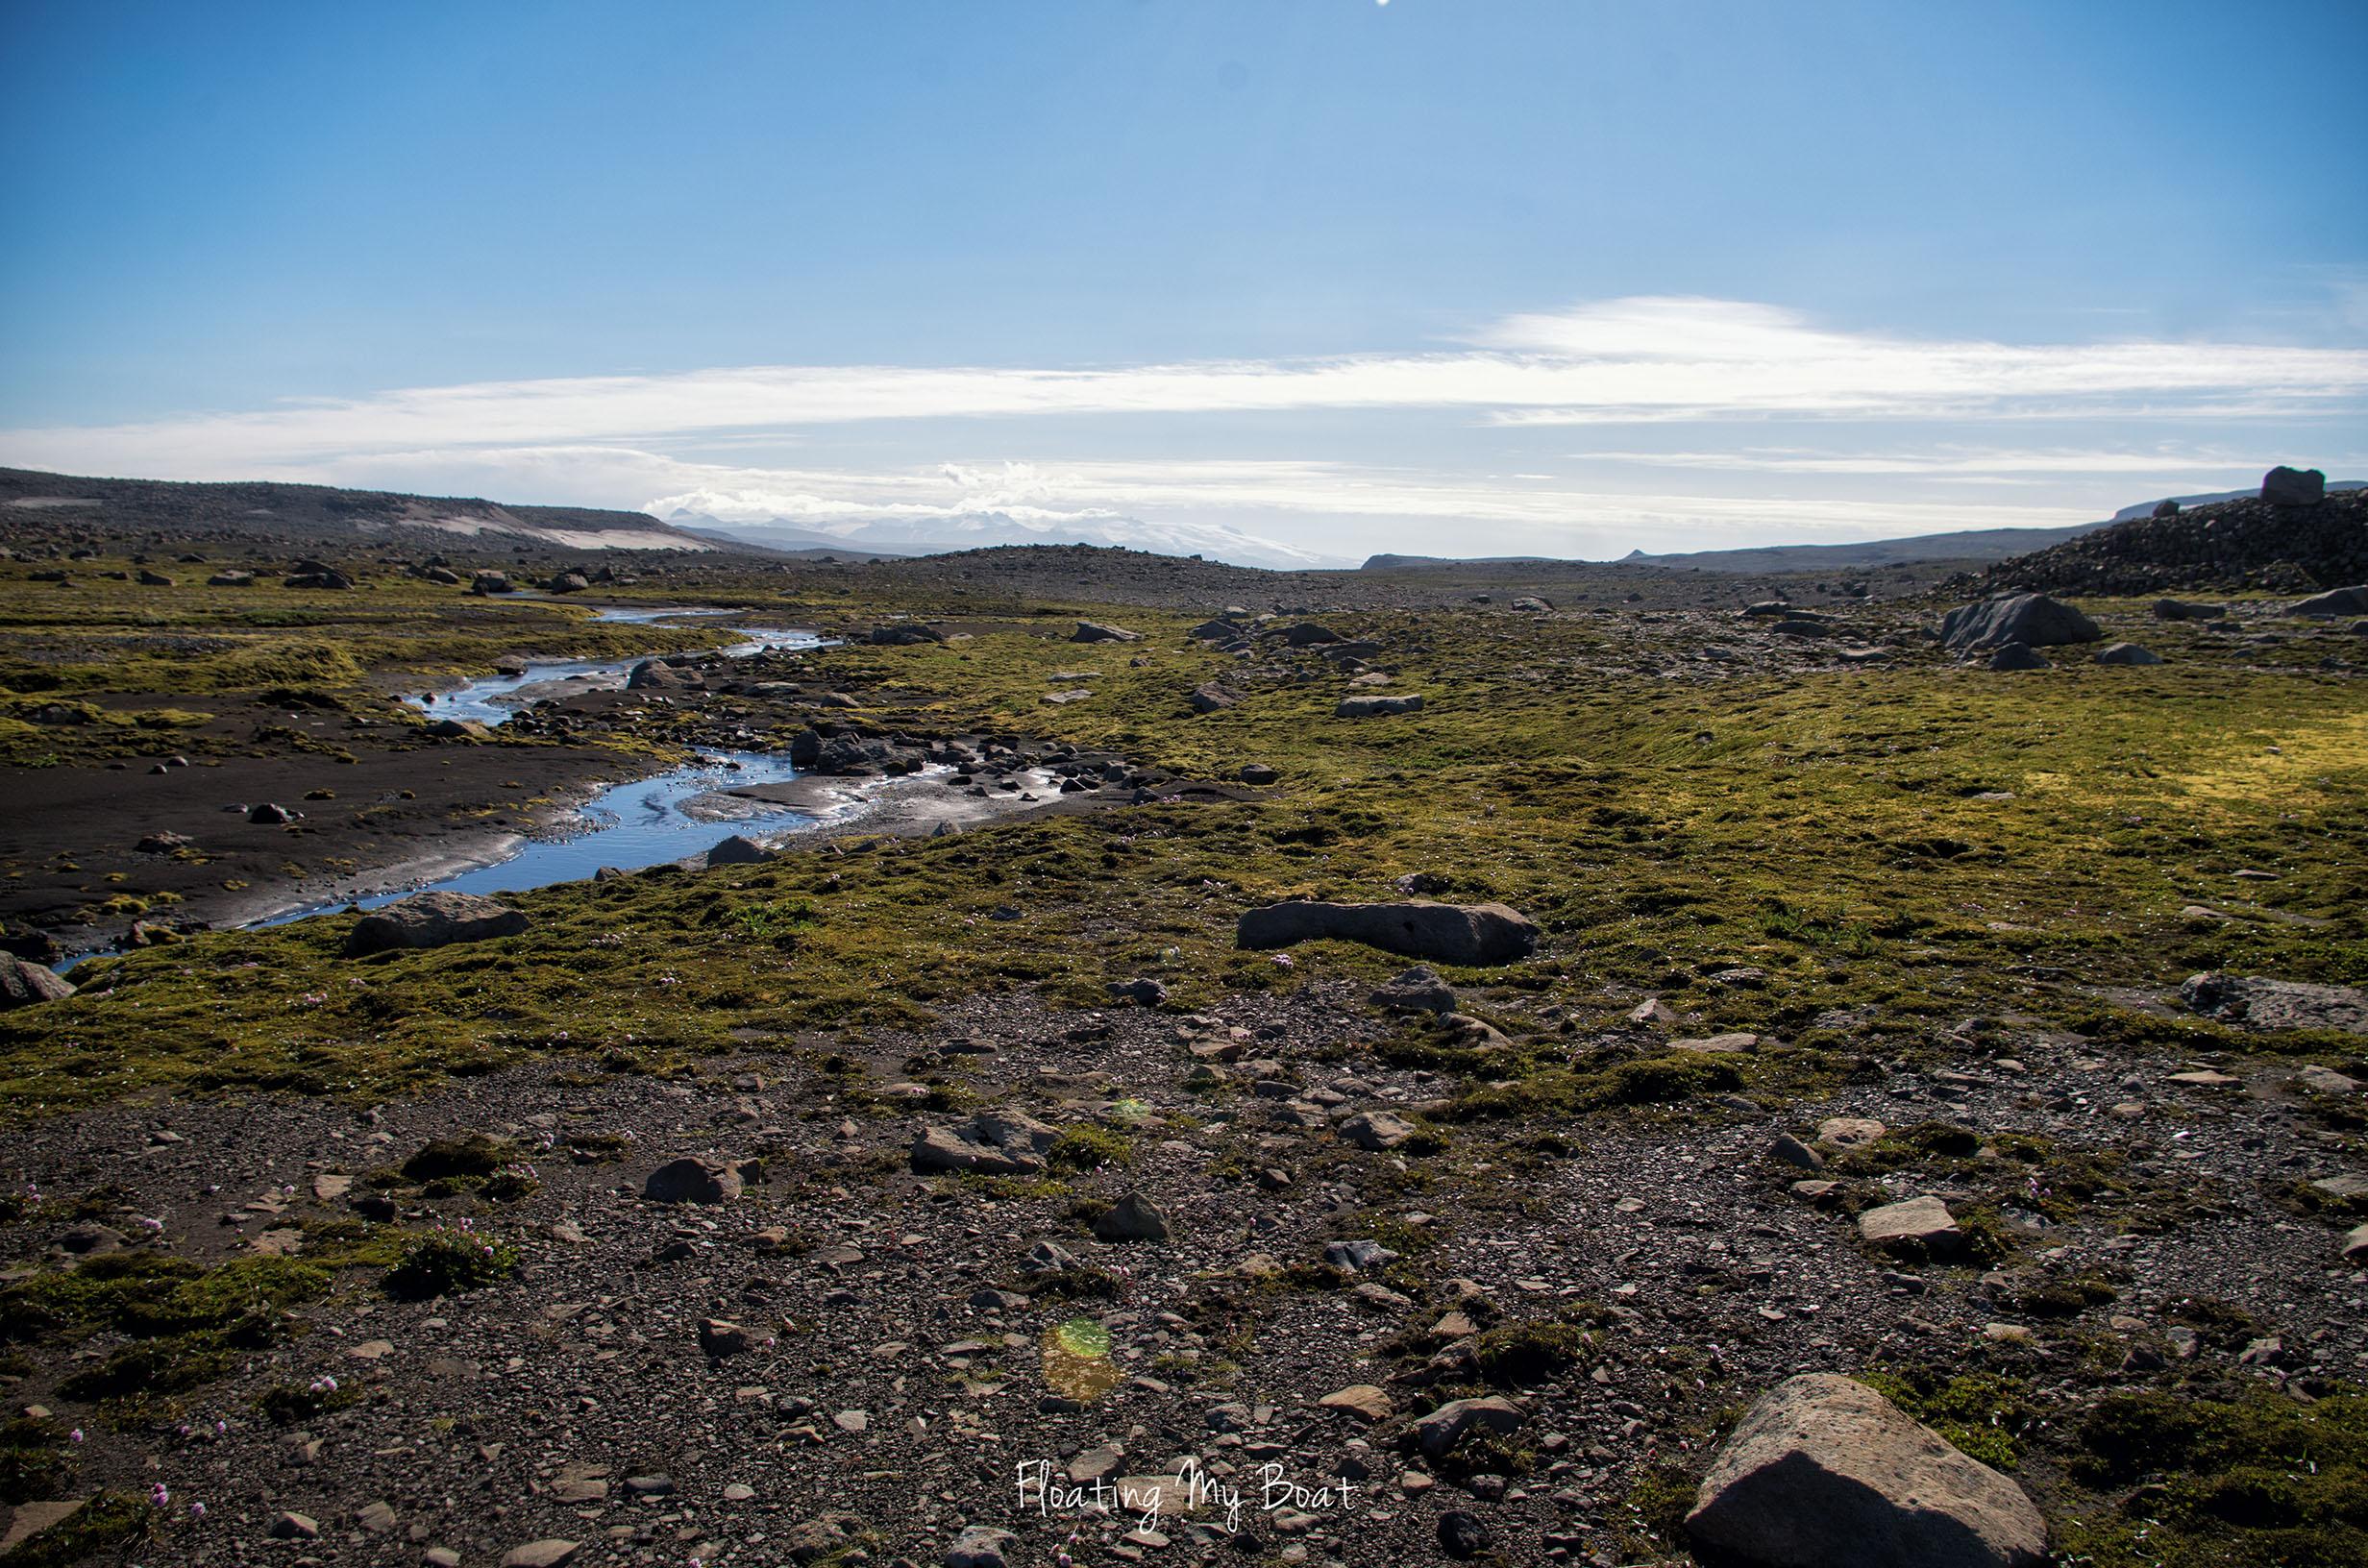 trekking-iceland-vatnajokull-national-park-22